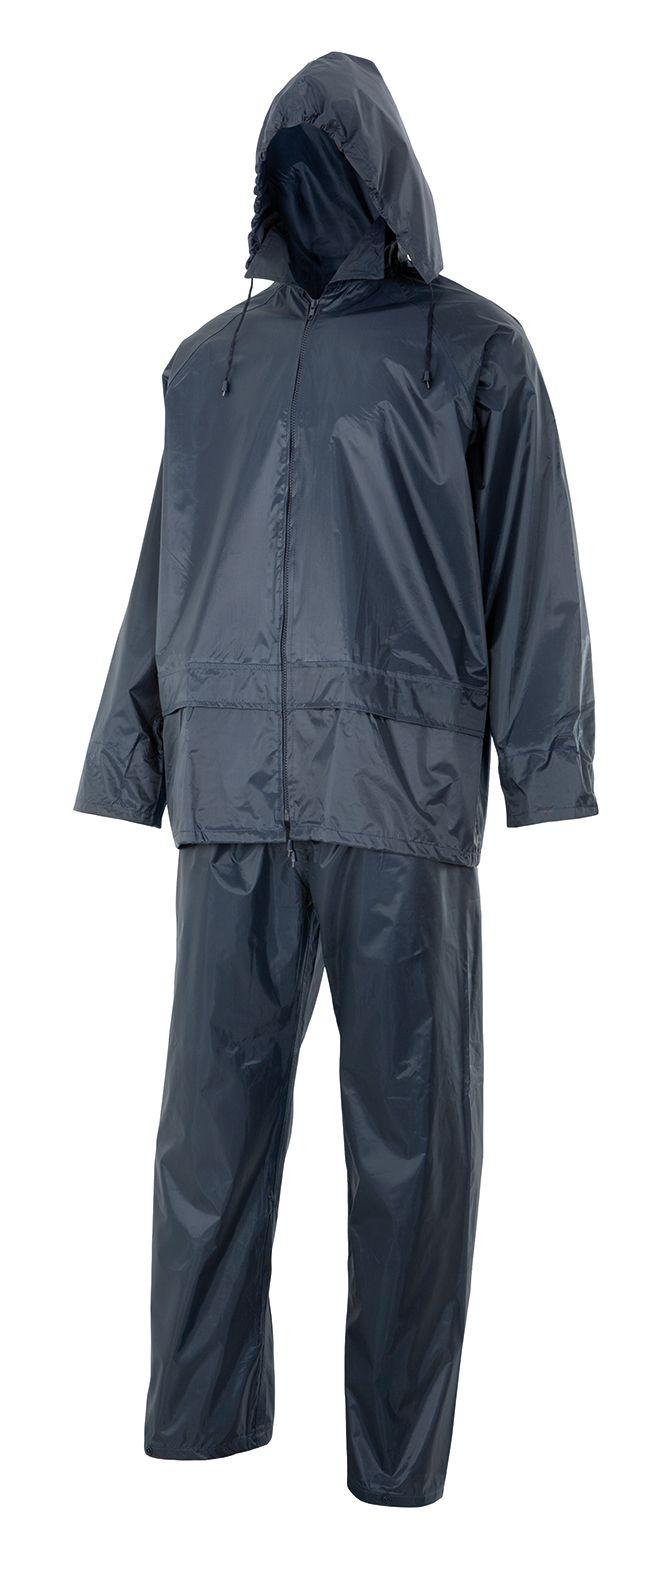 195 Traje de lluvia dos piezas con capucha oculta: Catálogo de Mòn Laboral